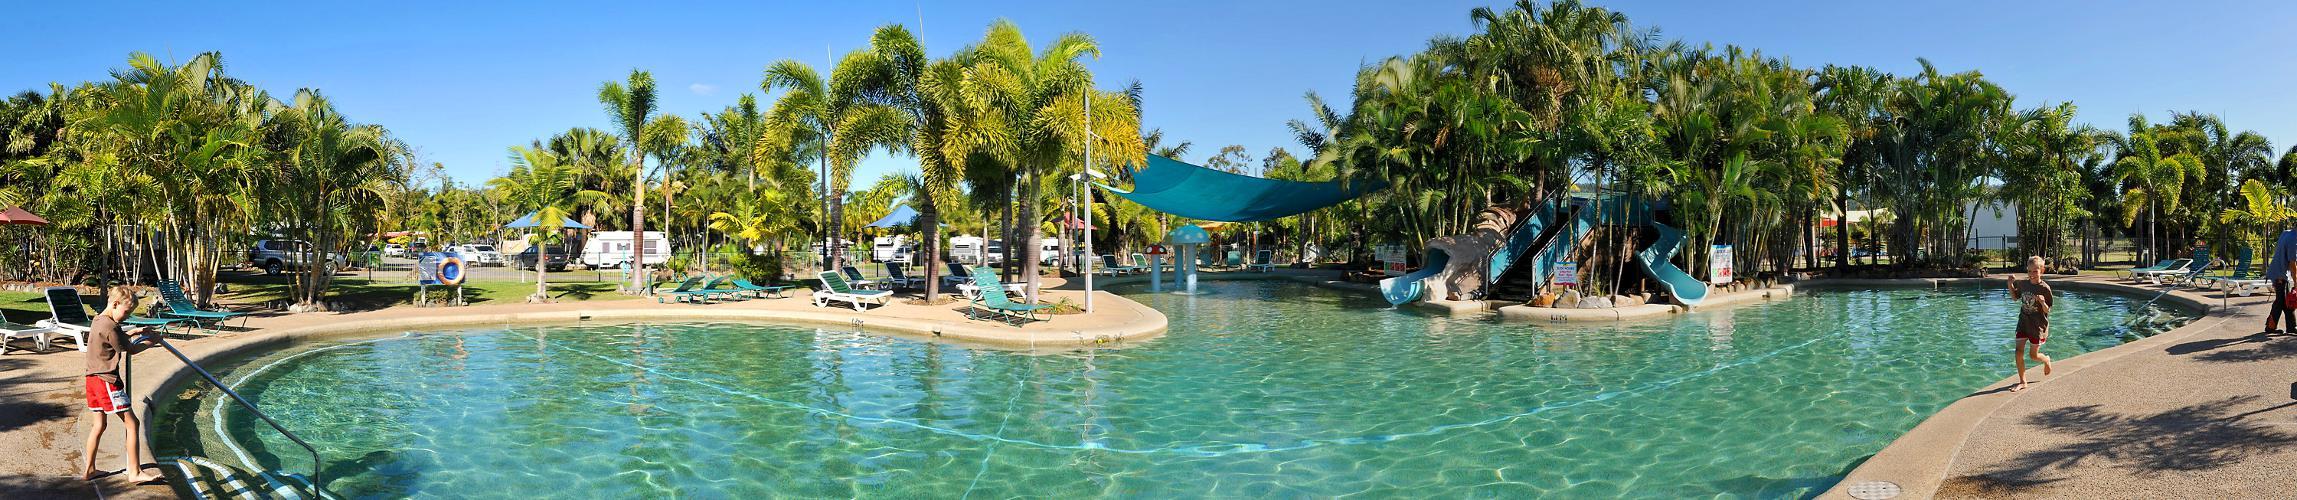 Big4 Adventure Whitsunday Resort Pool